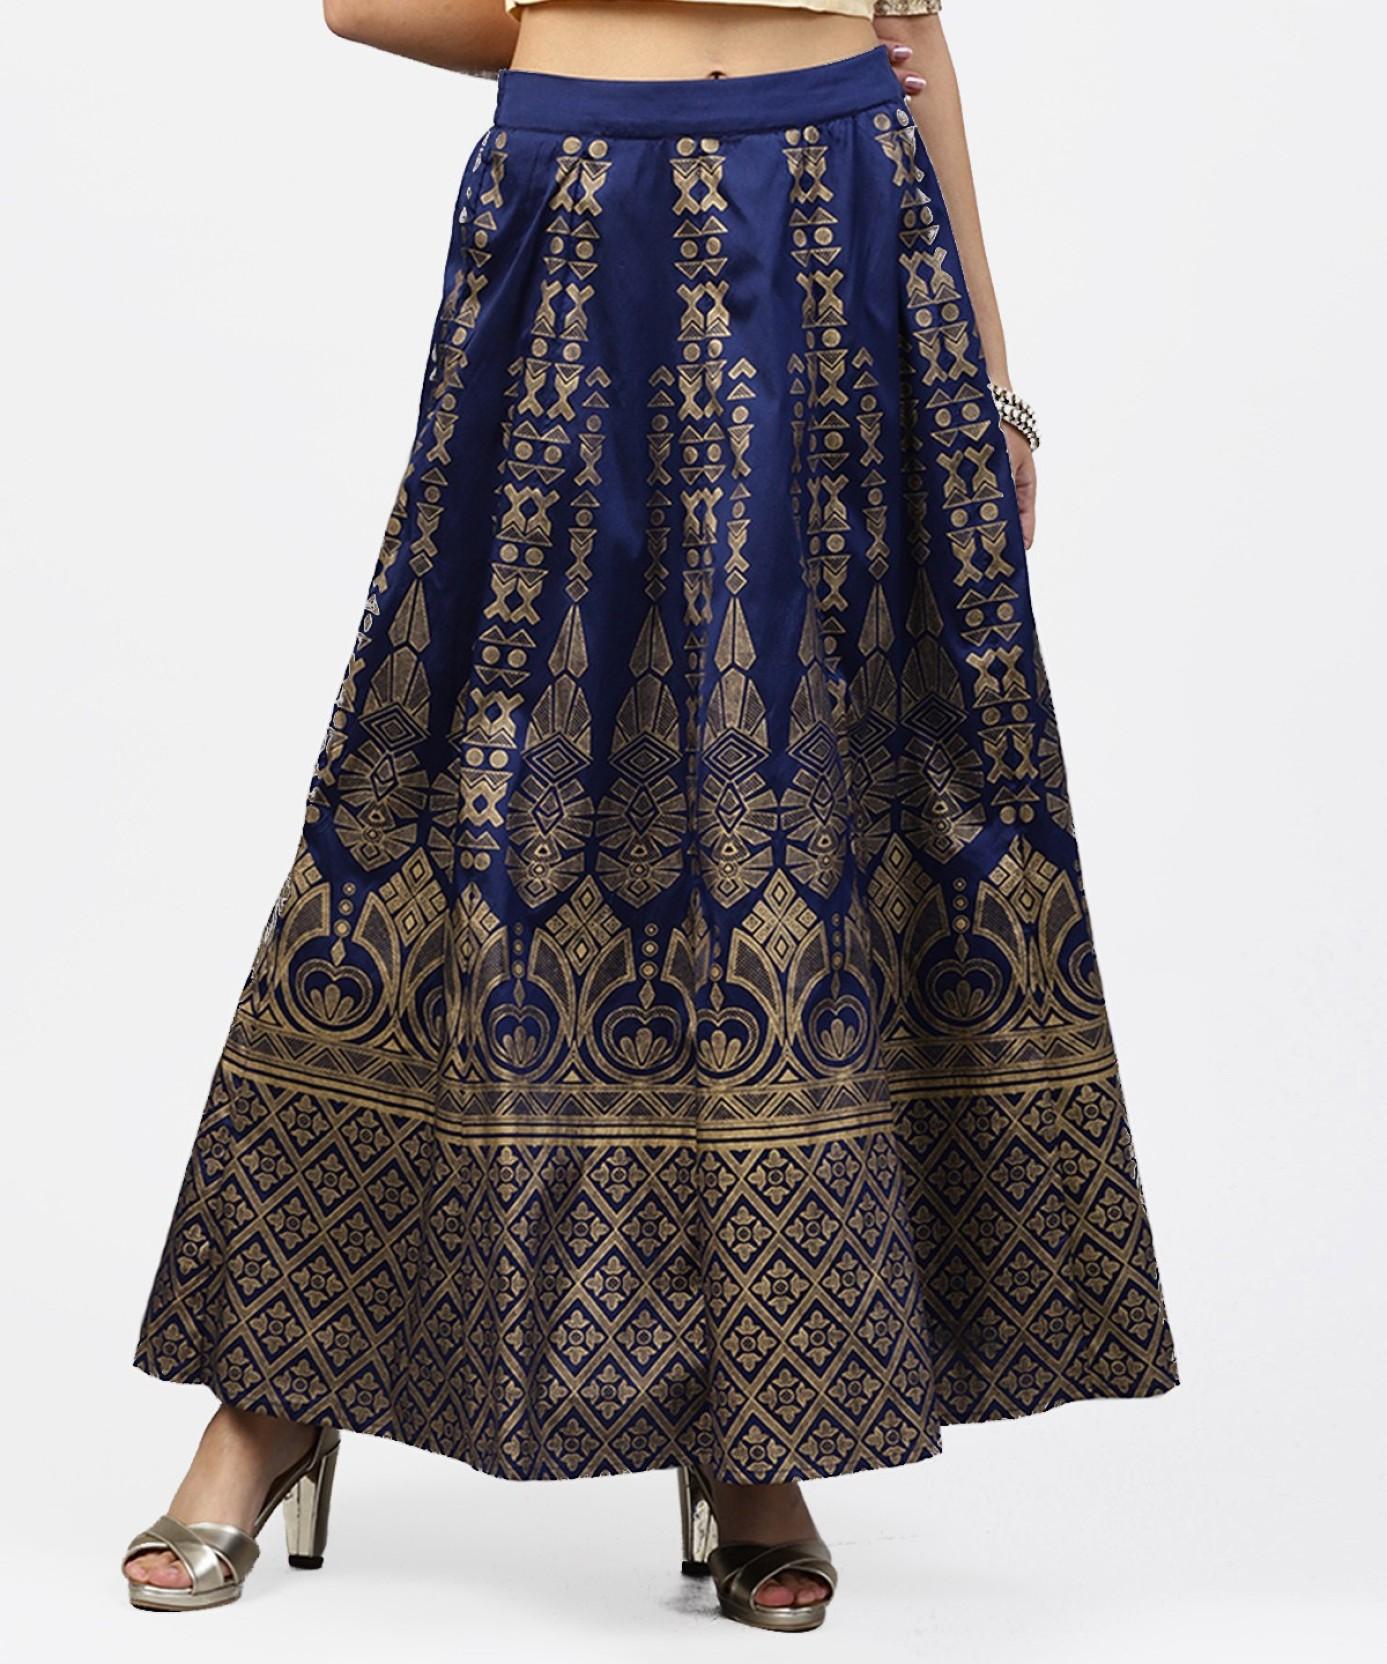 e3944998db8 Juniper Printed Women Flared Dark Blue Skirt - Buy Juniper Printed ...